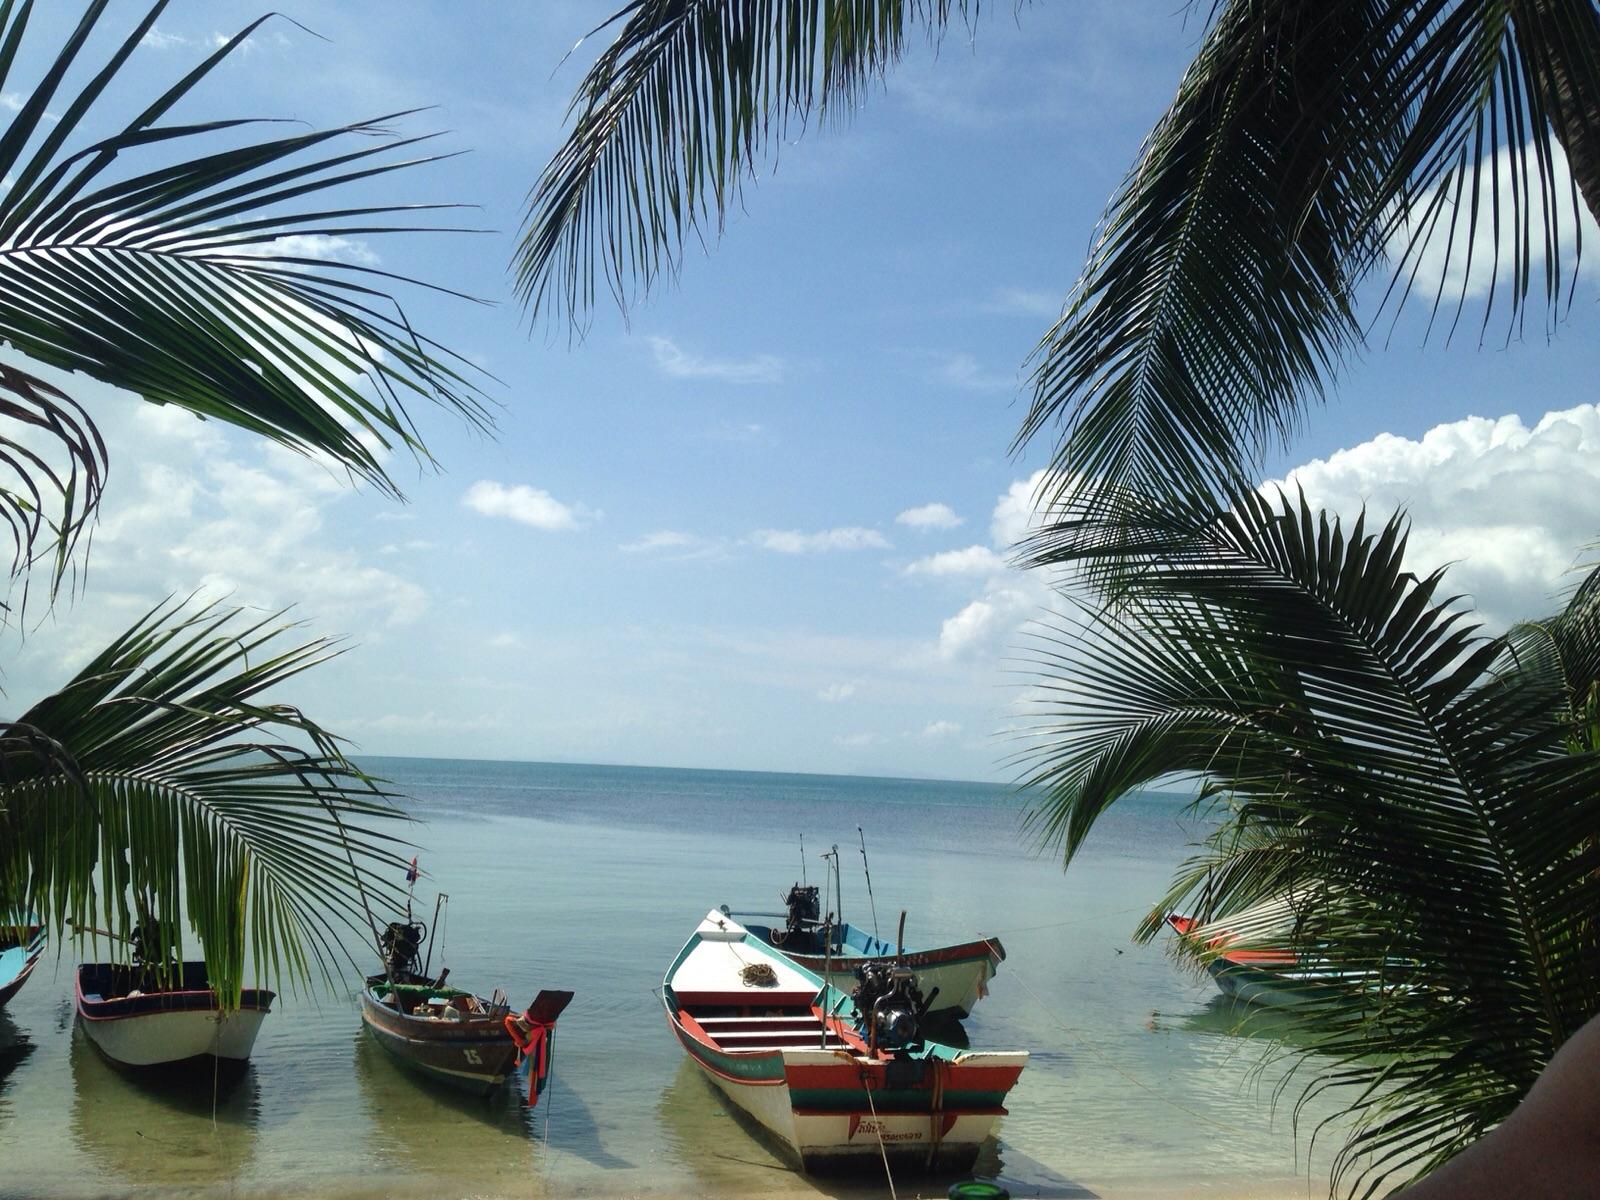 îles Thaïlande Koh Pha Ngan